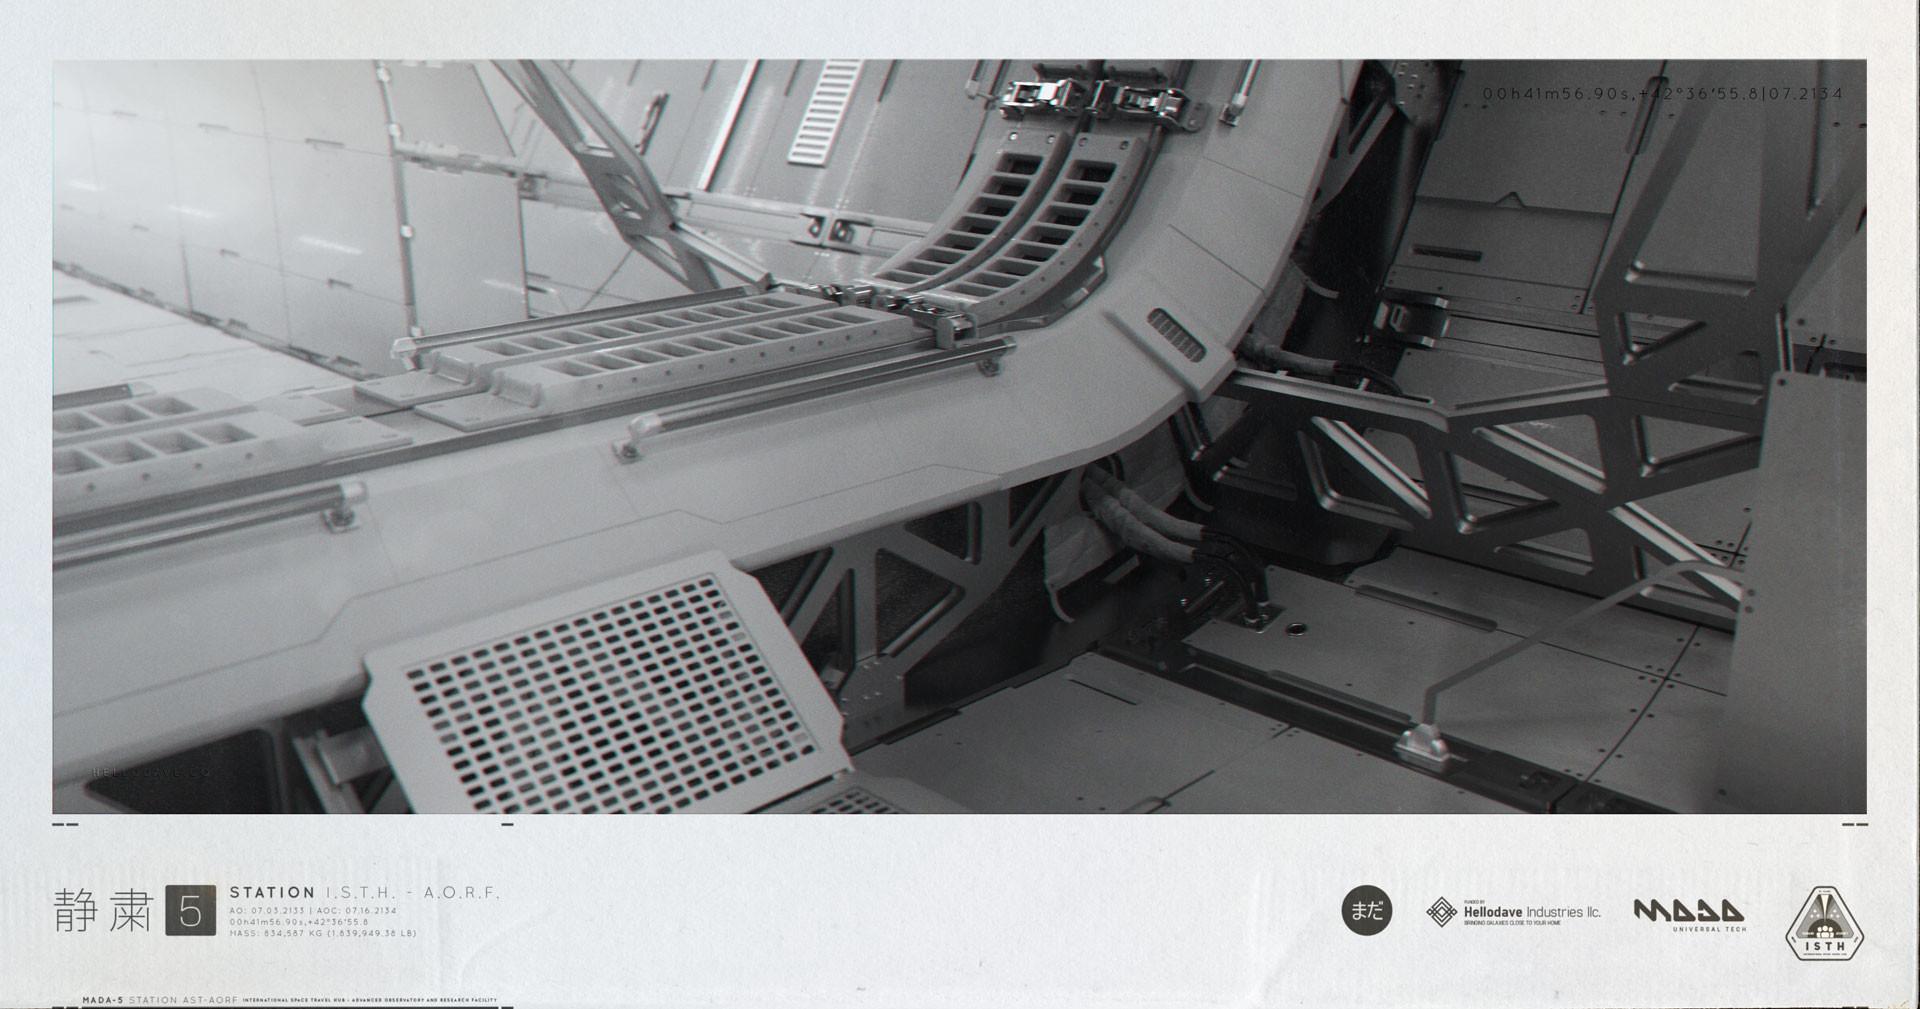 Davison carvalho station horizontal mon 04a